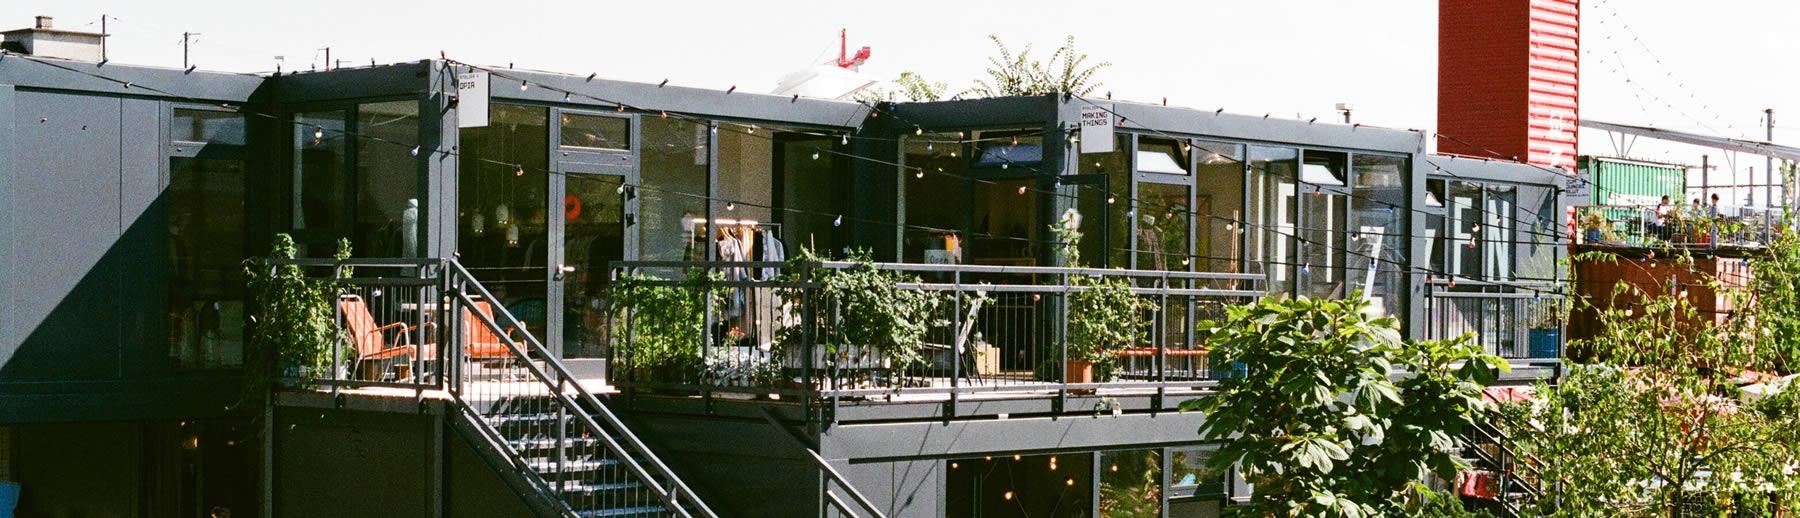 Shop Container im Frau Gerolds Garten